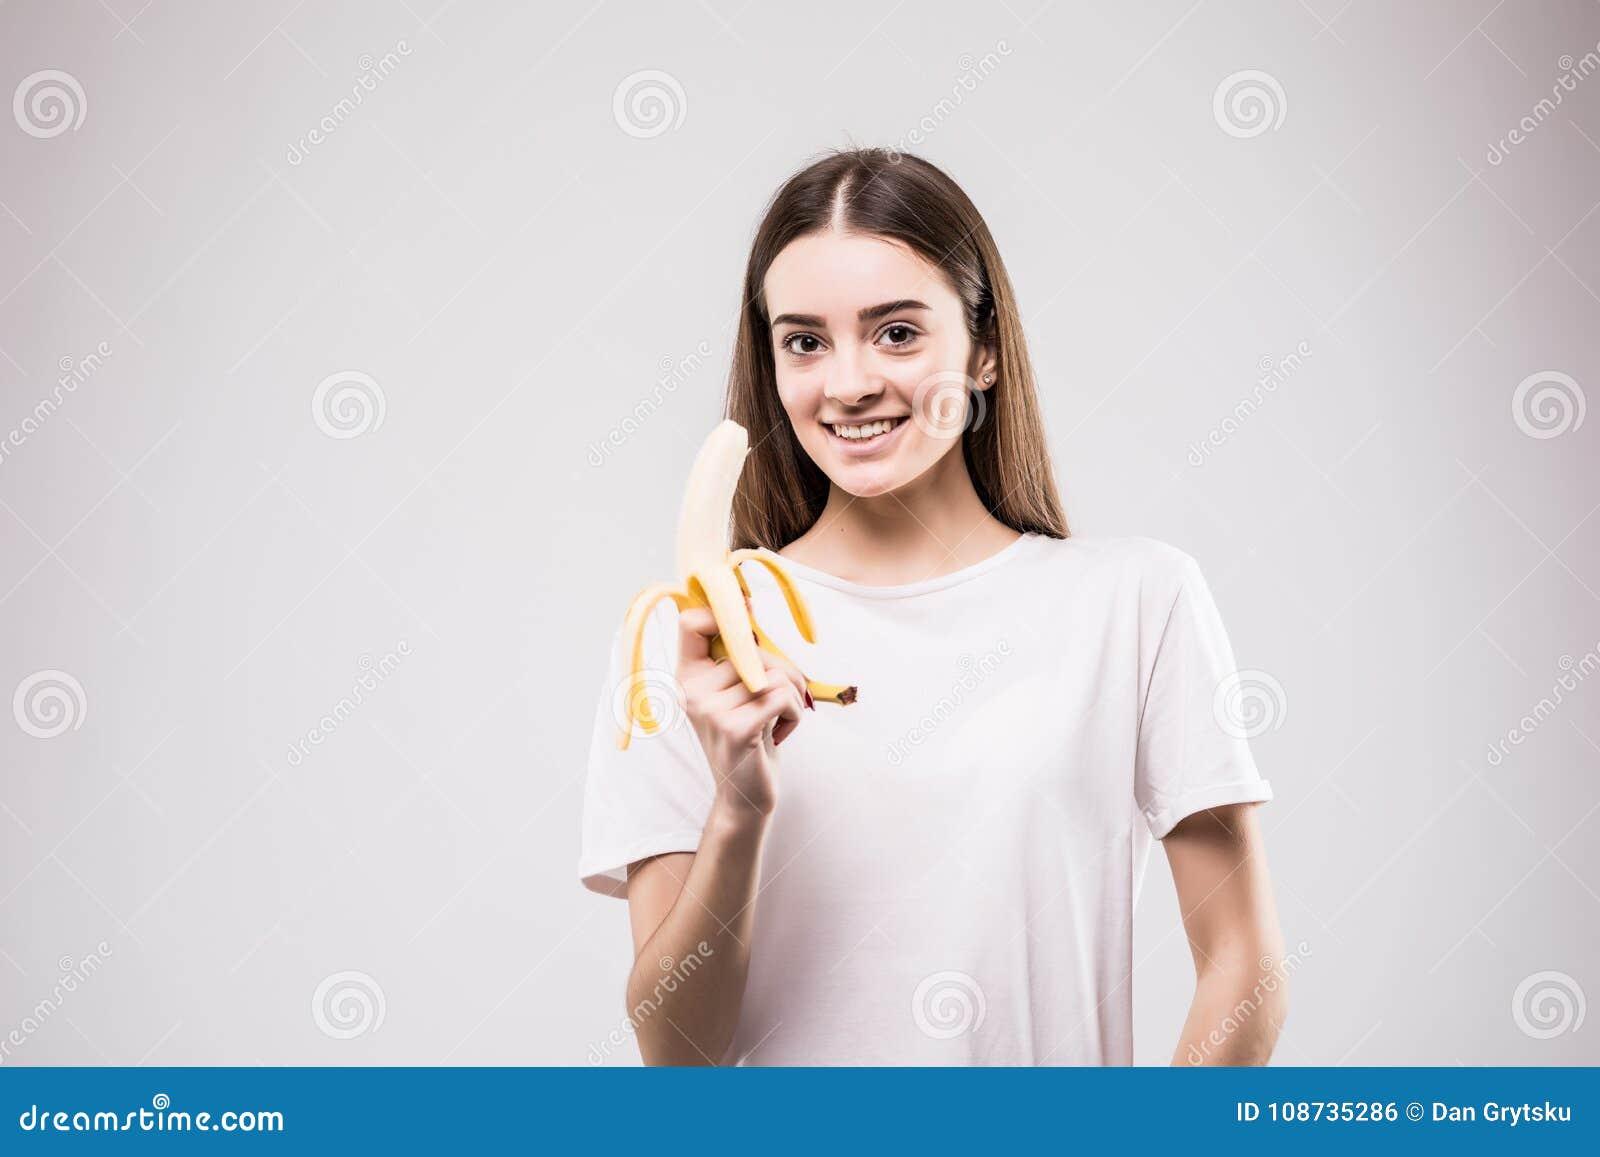 b399f0785092c Beautiful girl holding banana standing against isolated studio gray  background.